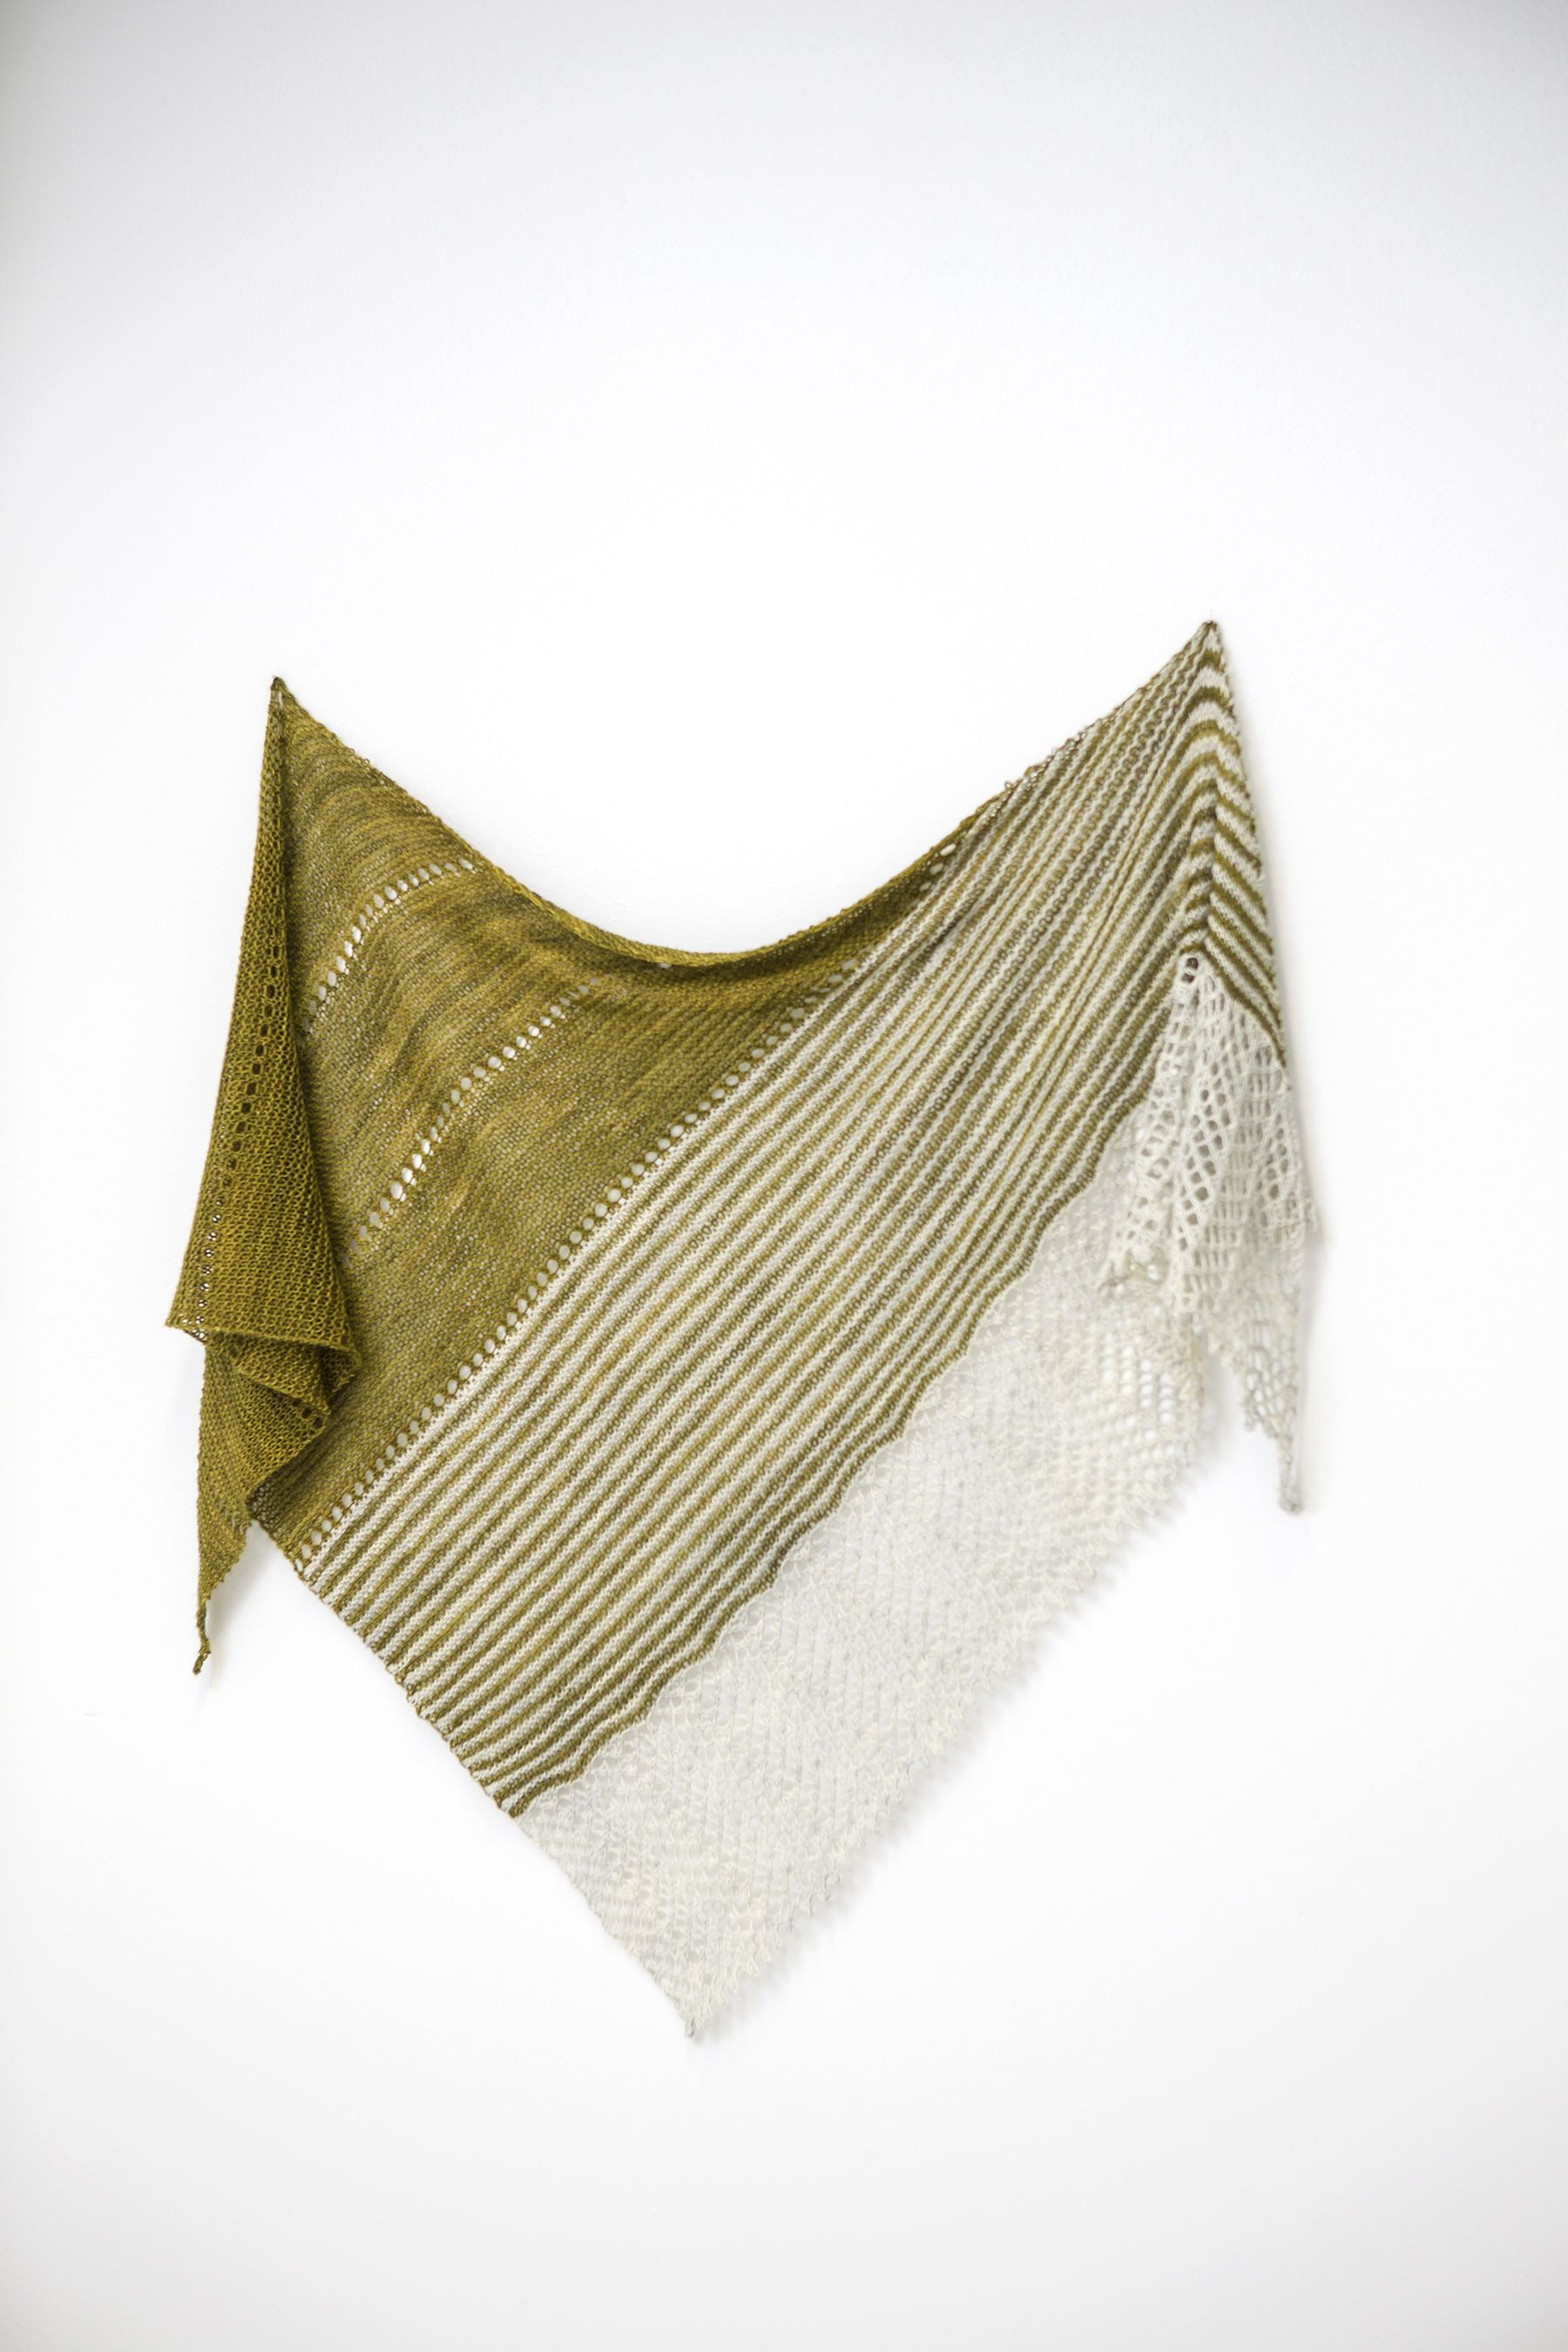 Spotlight Pattern By Janina Kallio Knitting Knitting Knitting